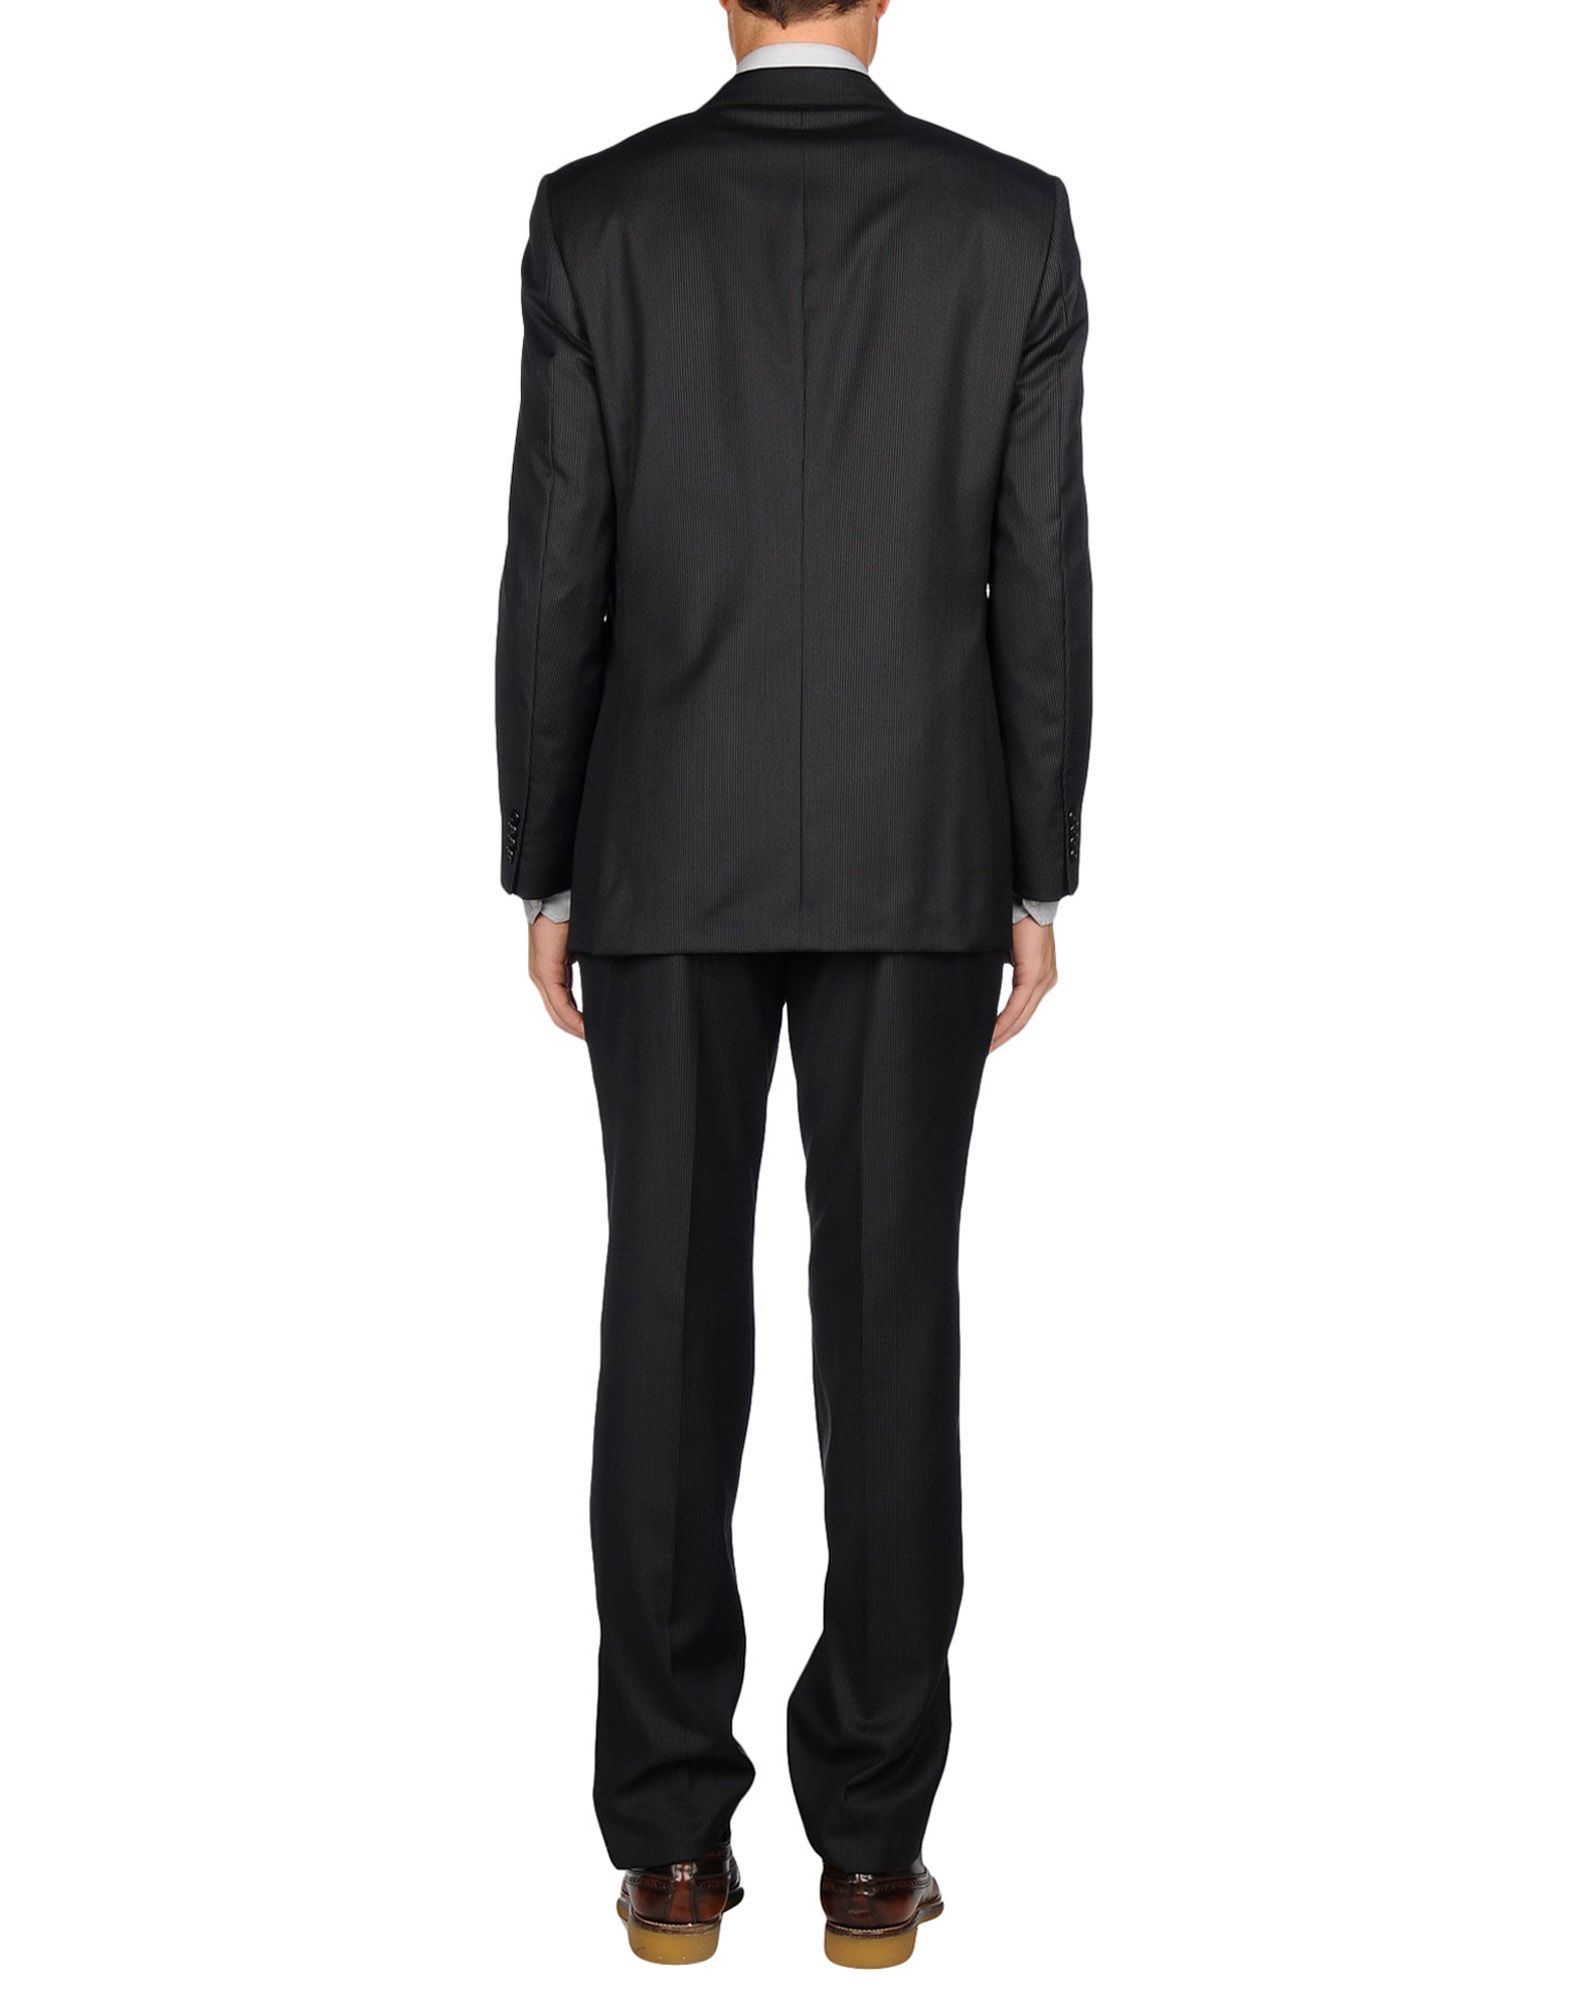 birdseye black single men Shop for verno men's piero grey and black birdseye textured classic fit italian style 3-piece suit get free delivery at overstockcom - your online men single.